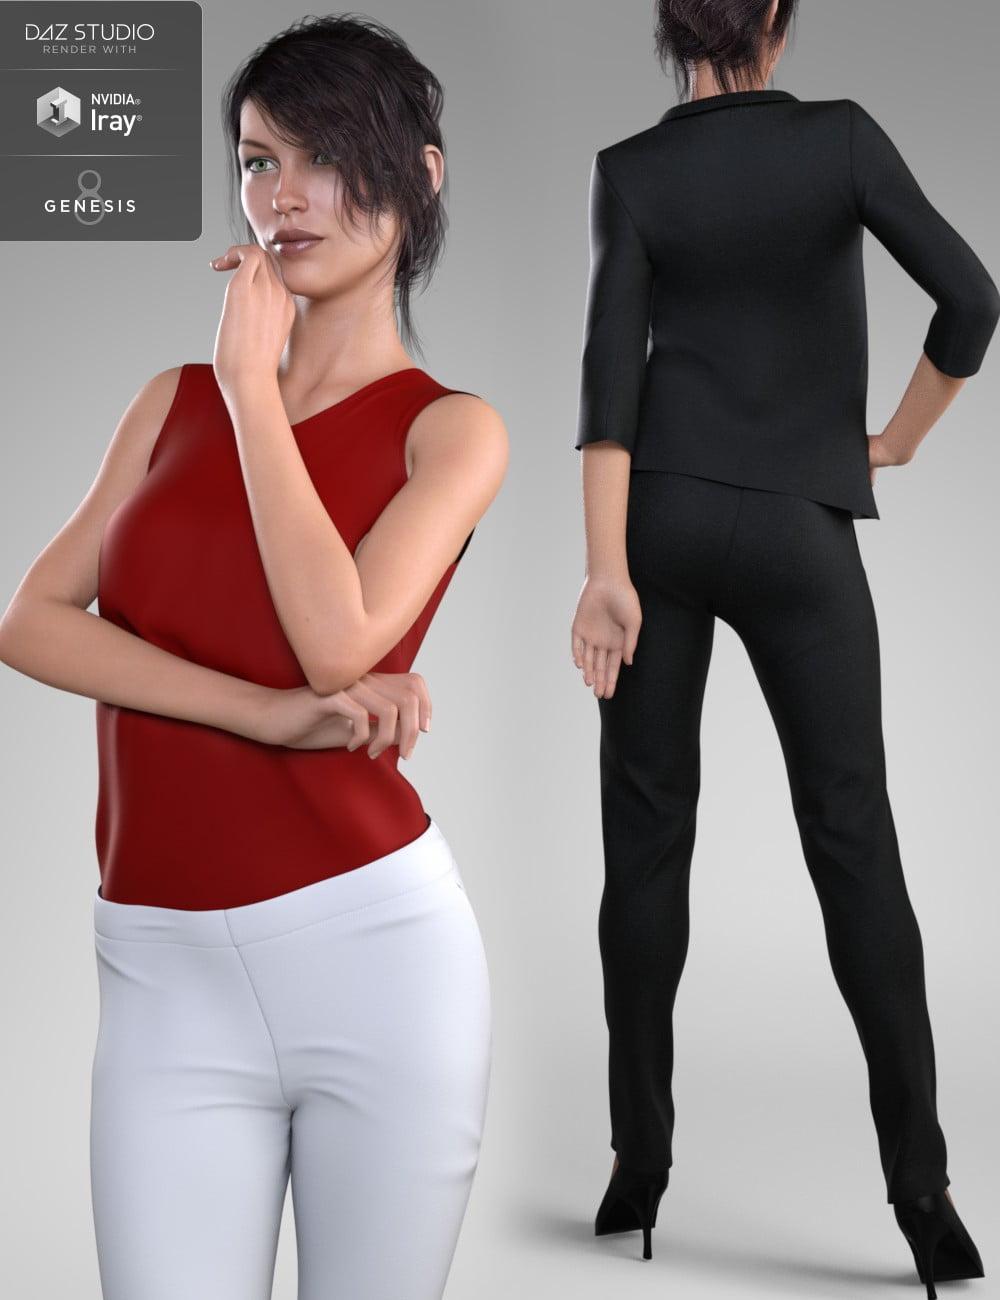 Stylish Workwear for Genesis 8 Female(s) - clothing, daz-poser-carrara